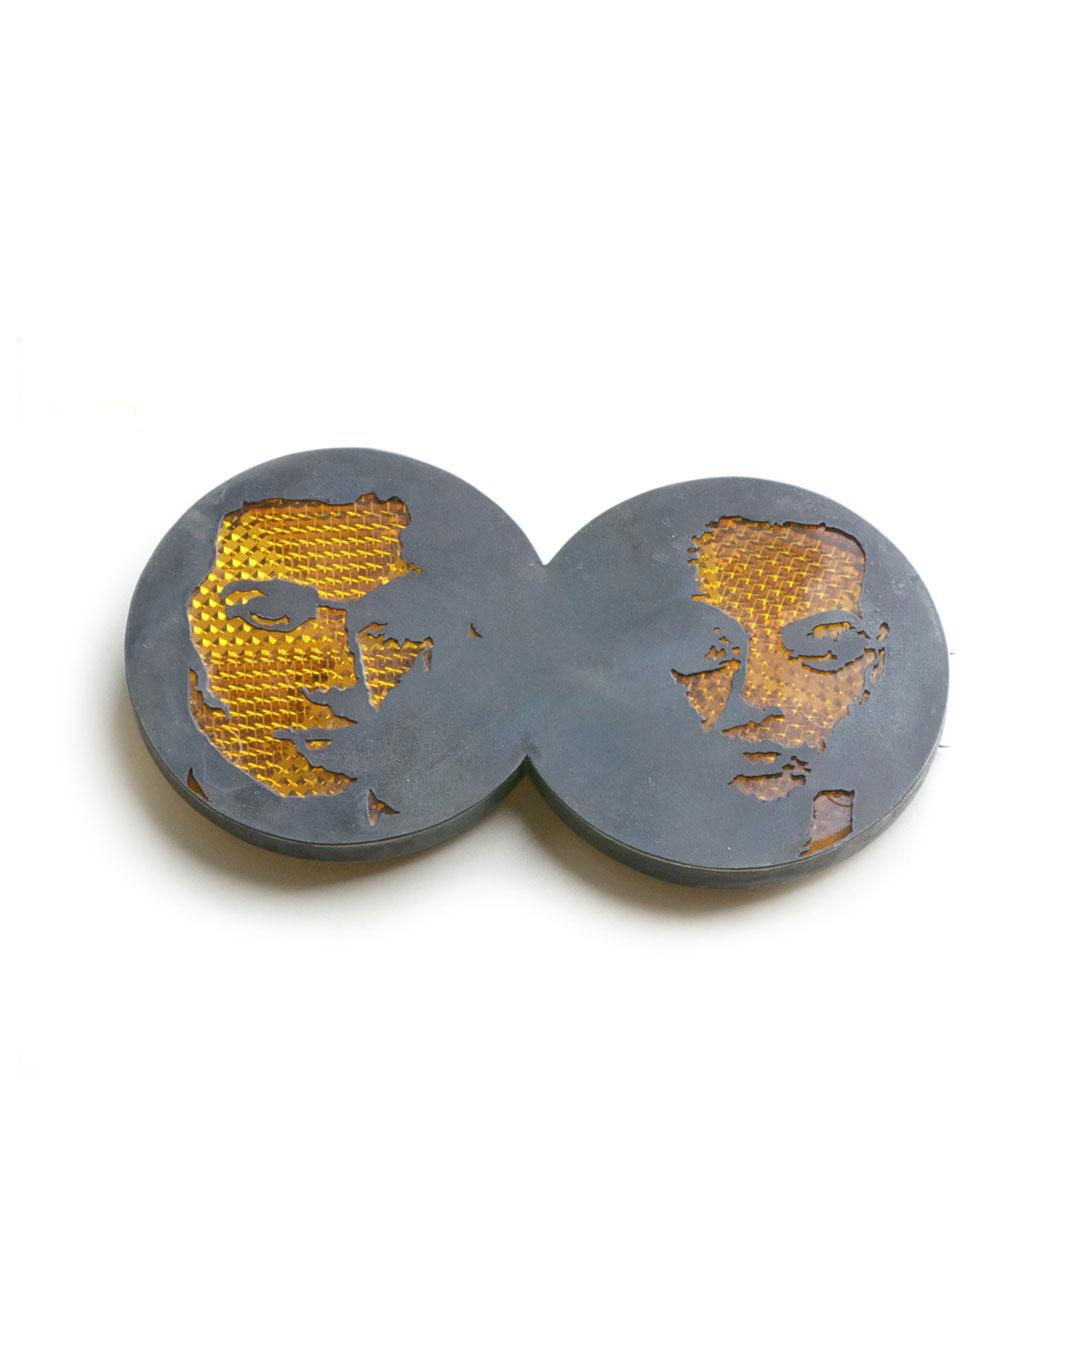 Vera Siemund, untitled, 2009, brooch; iron, plastic, silver, 115 x 60 x 10 mm, €710